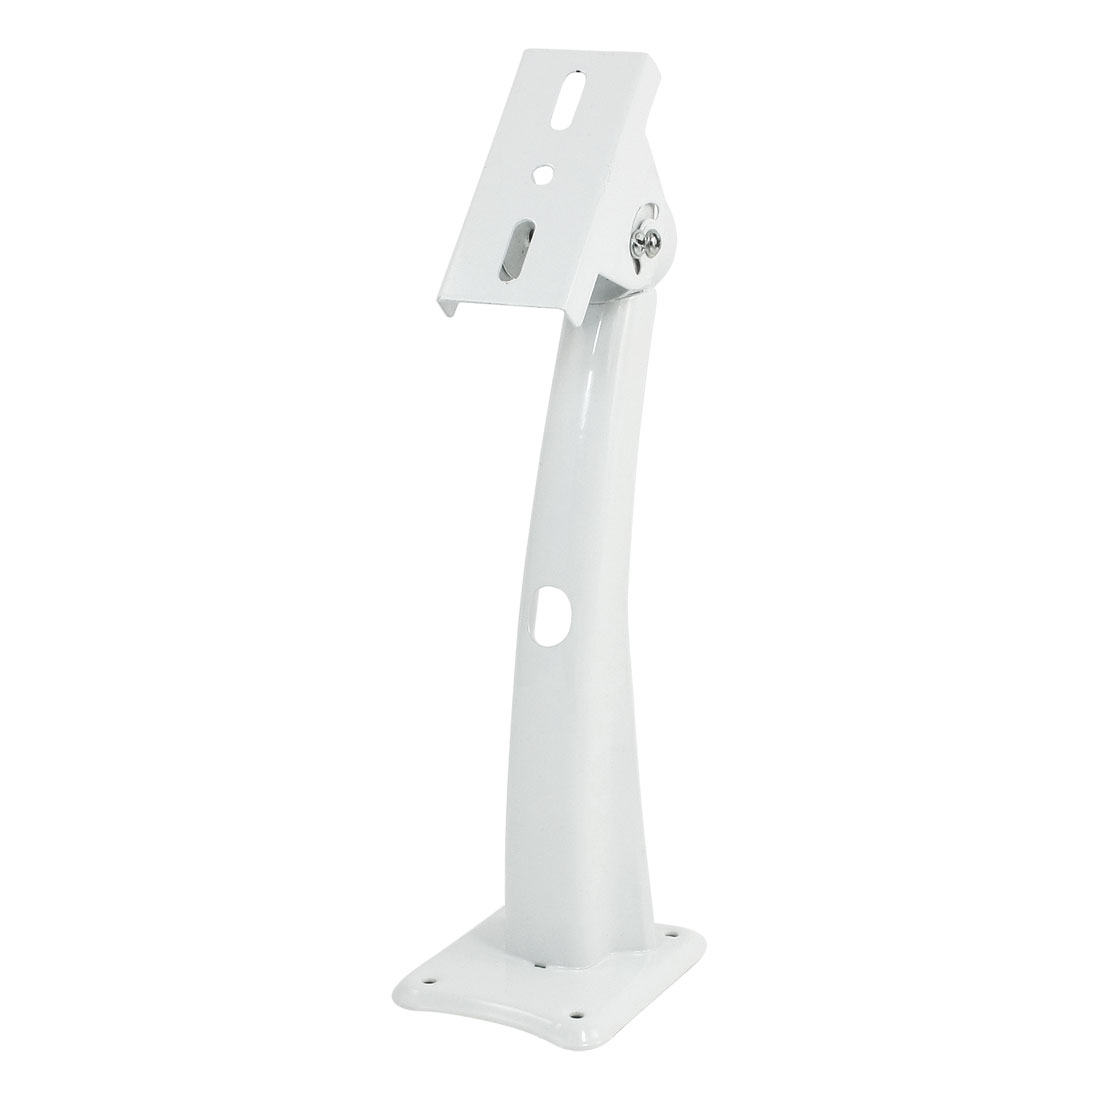 "DVR CCTV CCD Camera Adjustable White Metal Bracket Stand 8.7"" High"